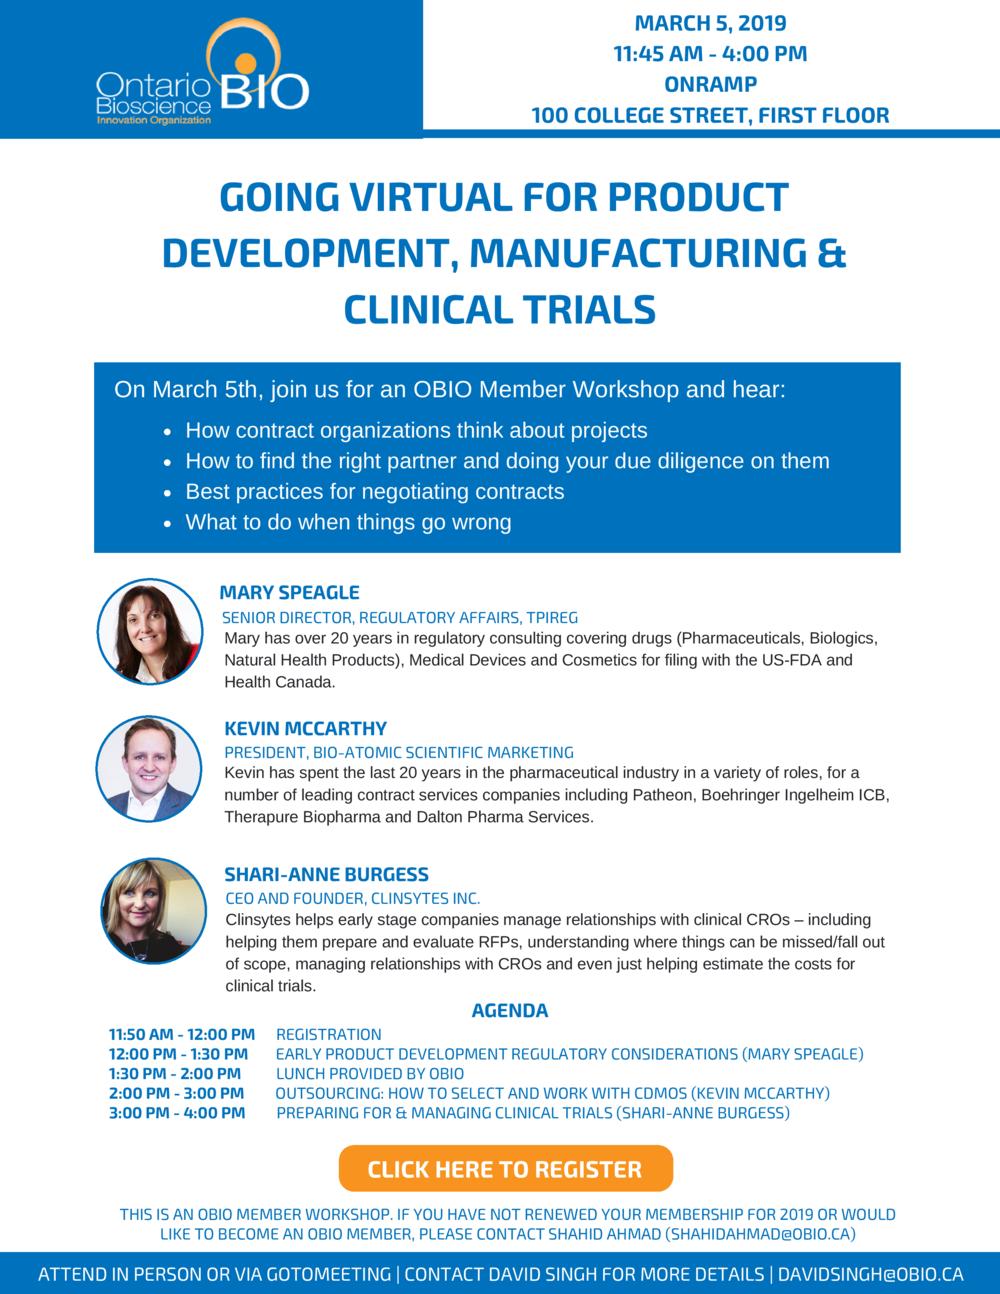 Going Virtual - OBIO Workshop, Mar 5, 2019.png